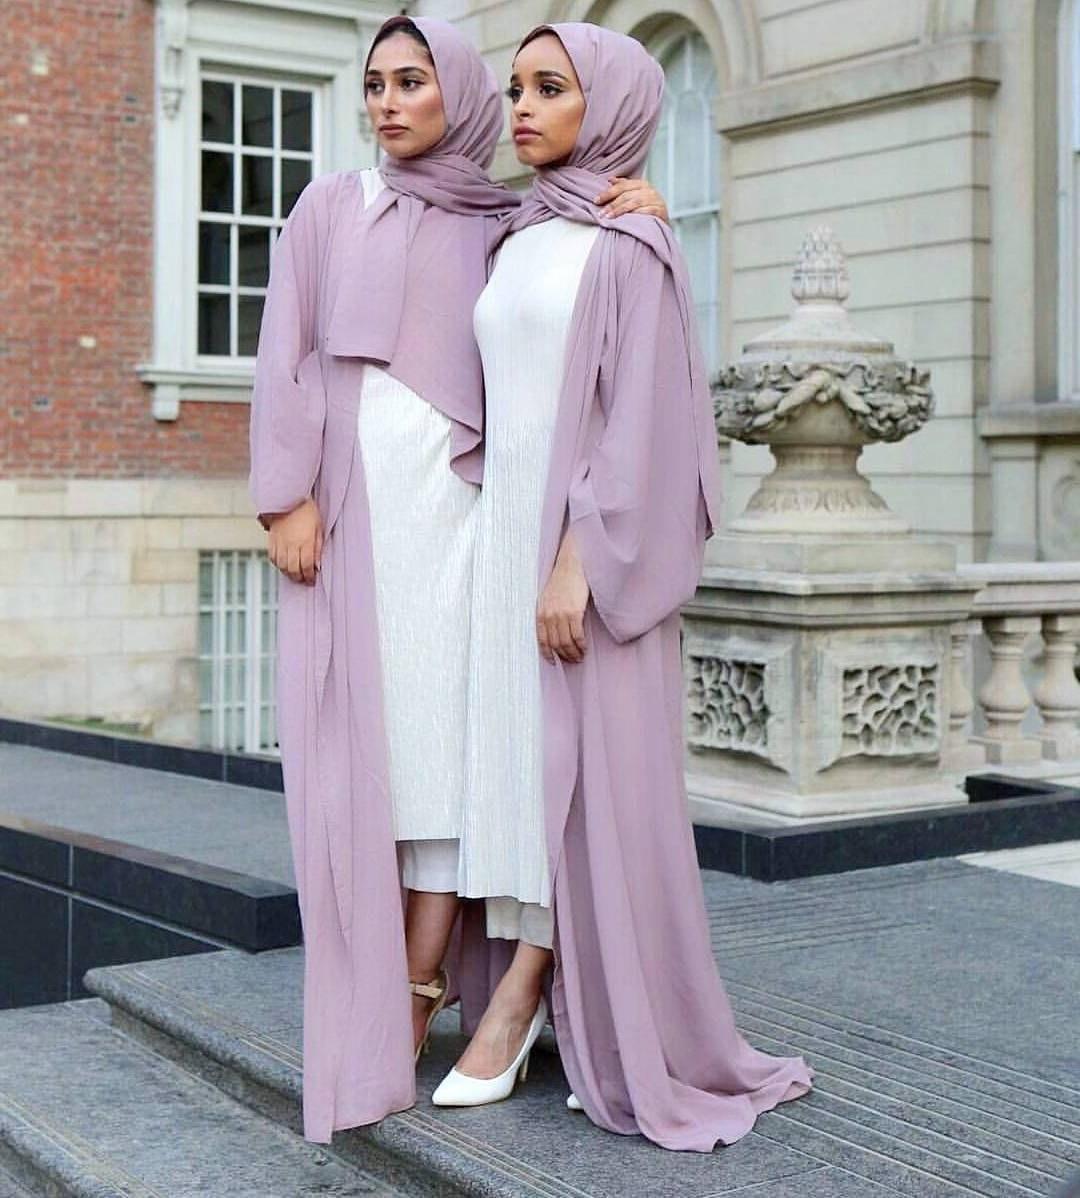 Design Model Baju Lebaran 2018 Ipdd 50 Model Baju Lebaran Terbaru 2018 Modern & Elegan